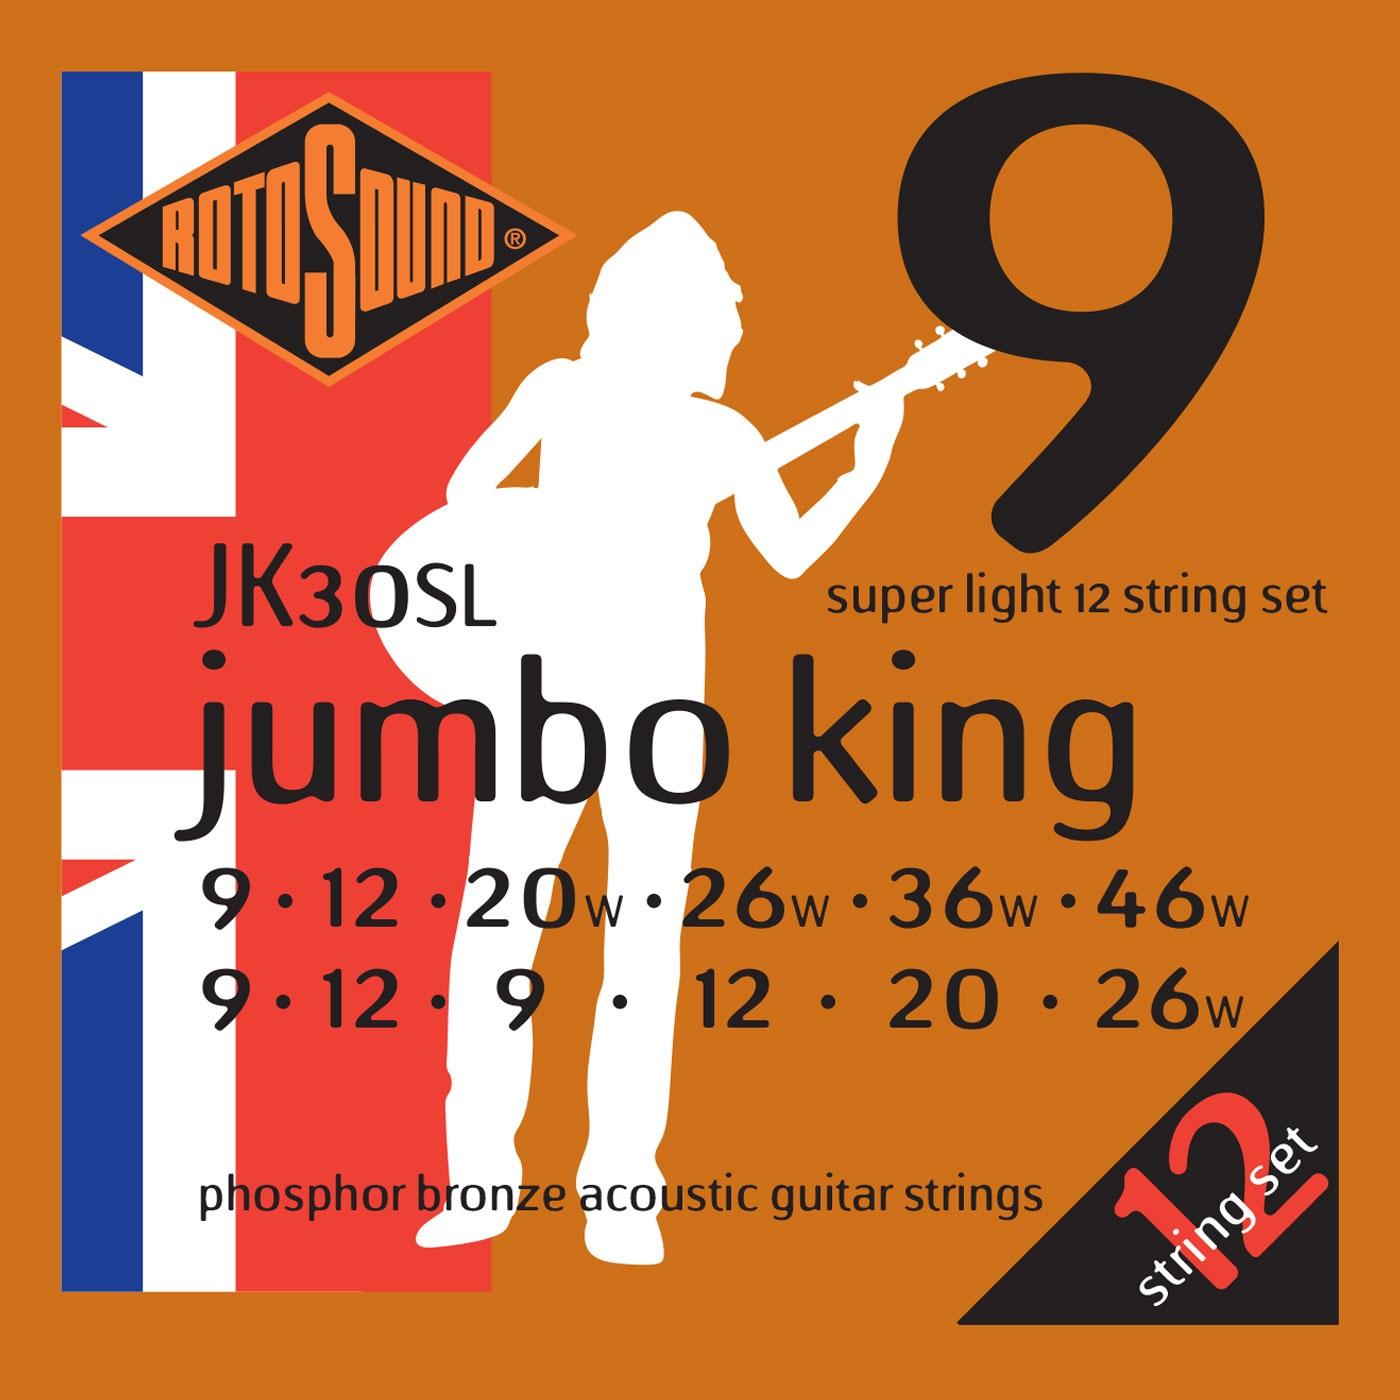 Rotosound JK30SL Jumbo King